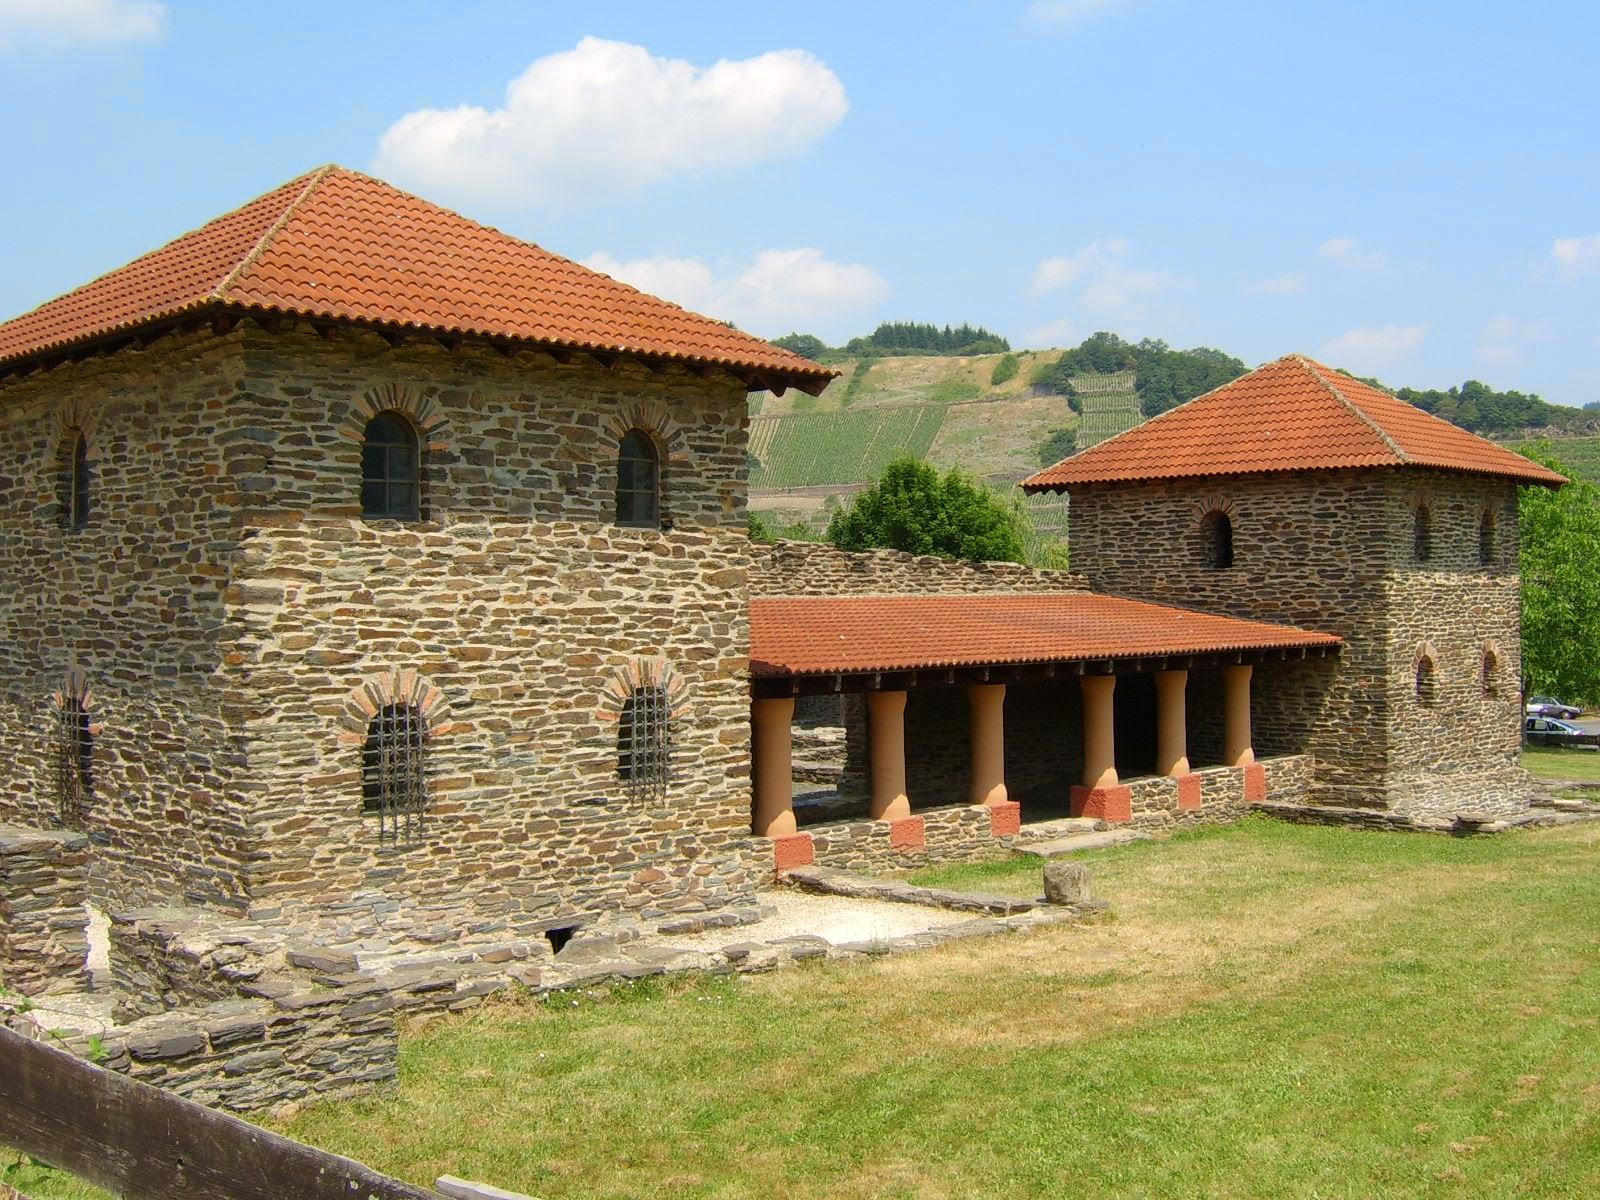 villa rustica in mehring.jpg